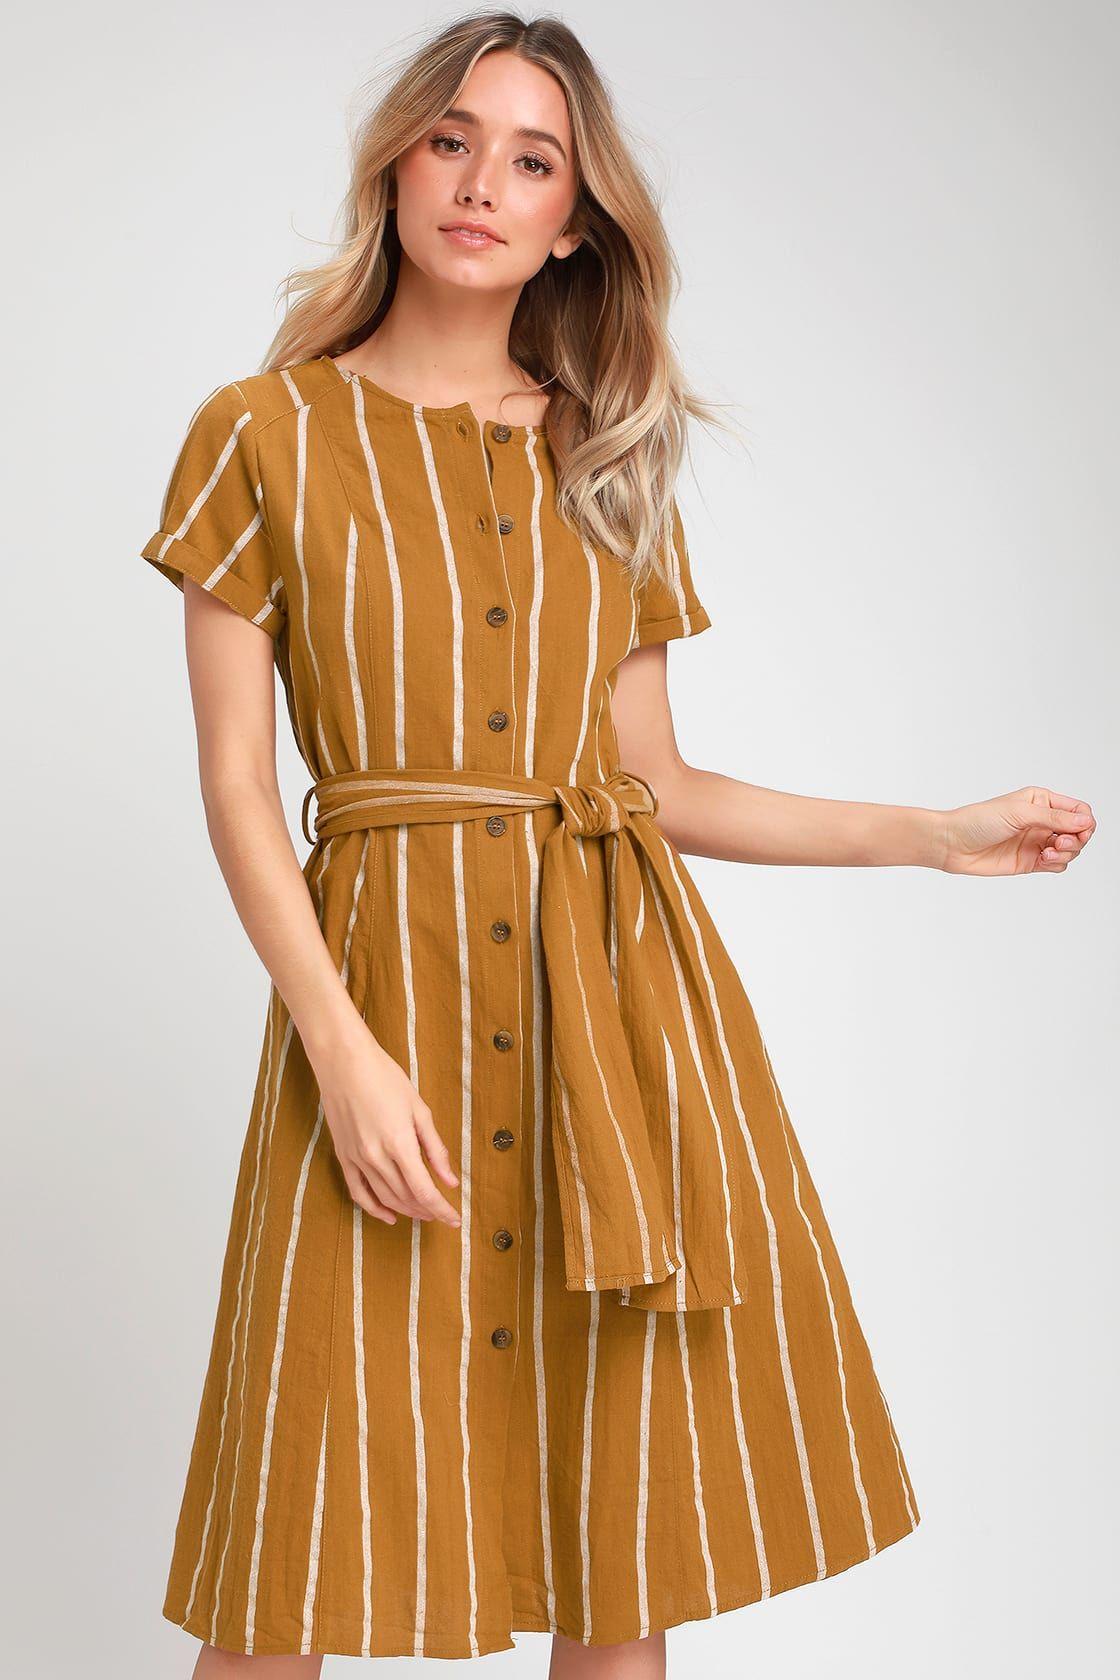 eb656dcc0d4fb Lulus   Epitome Dark Mustard Yellow Striped Midi Shirt Dress   Size ...